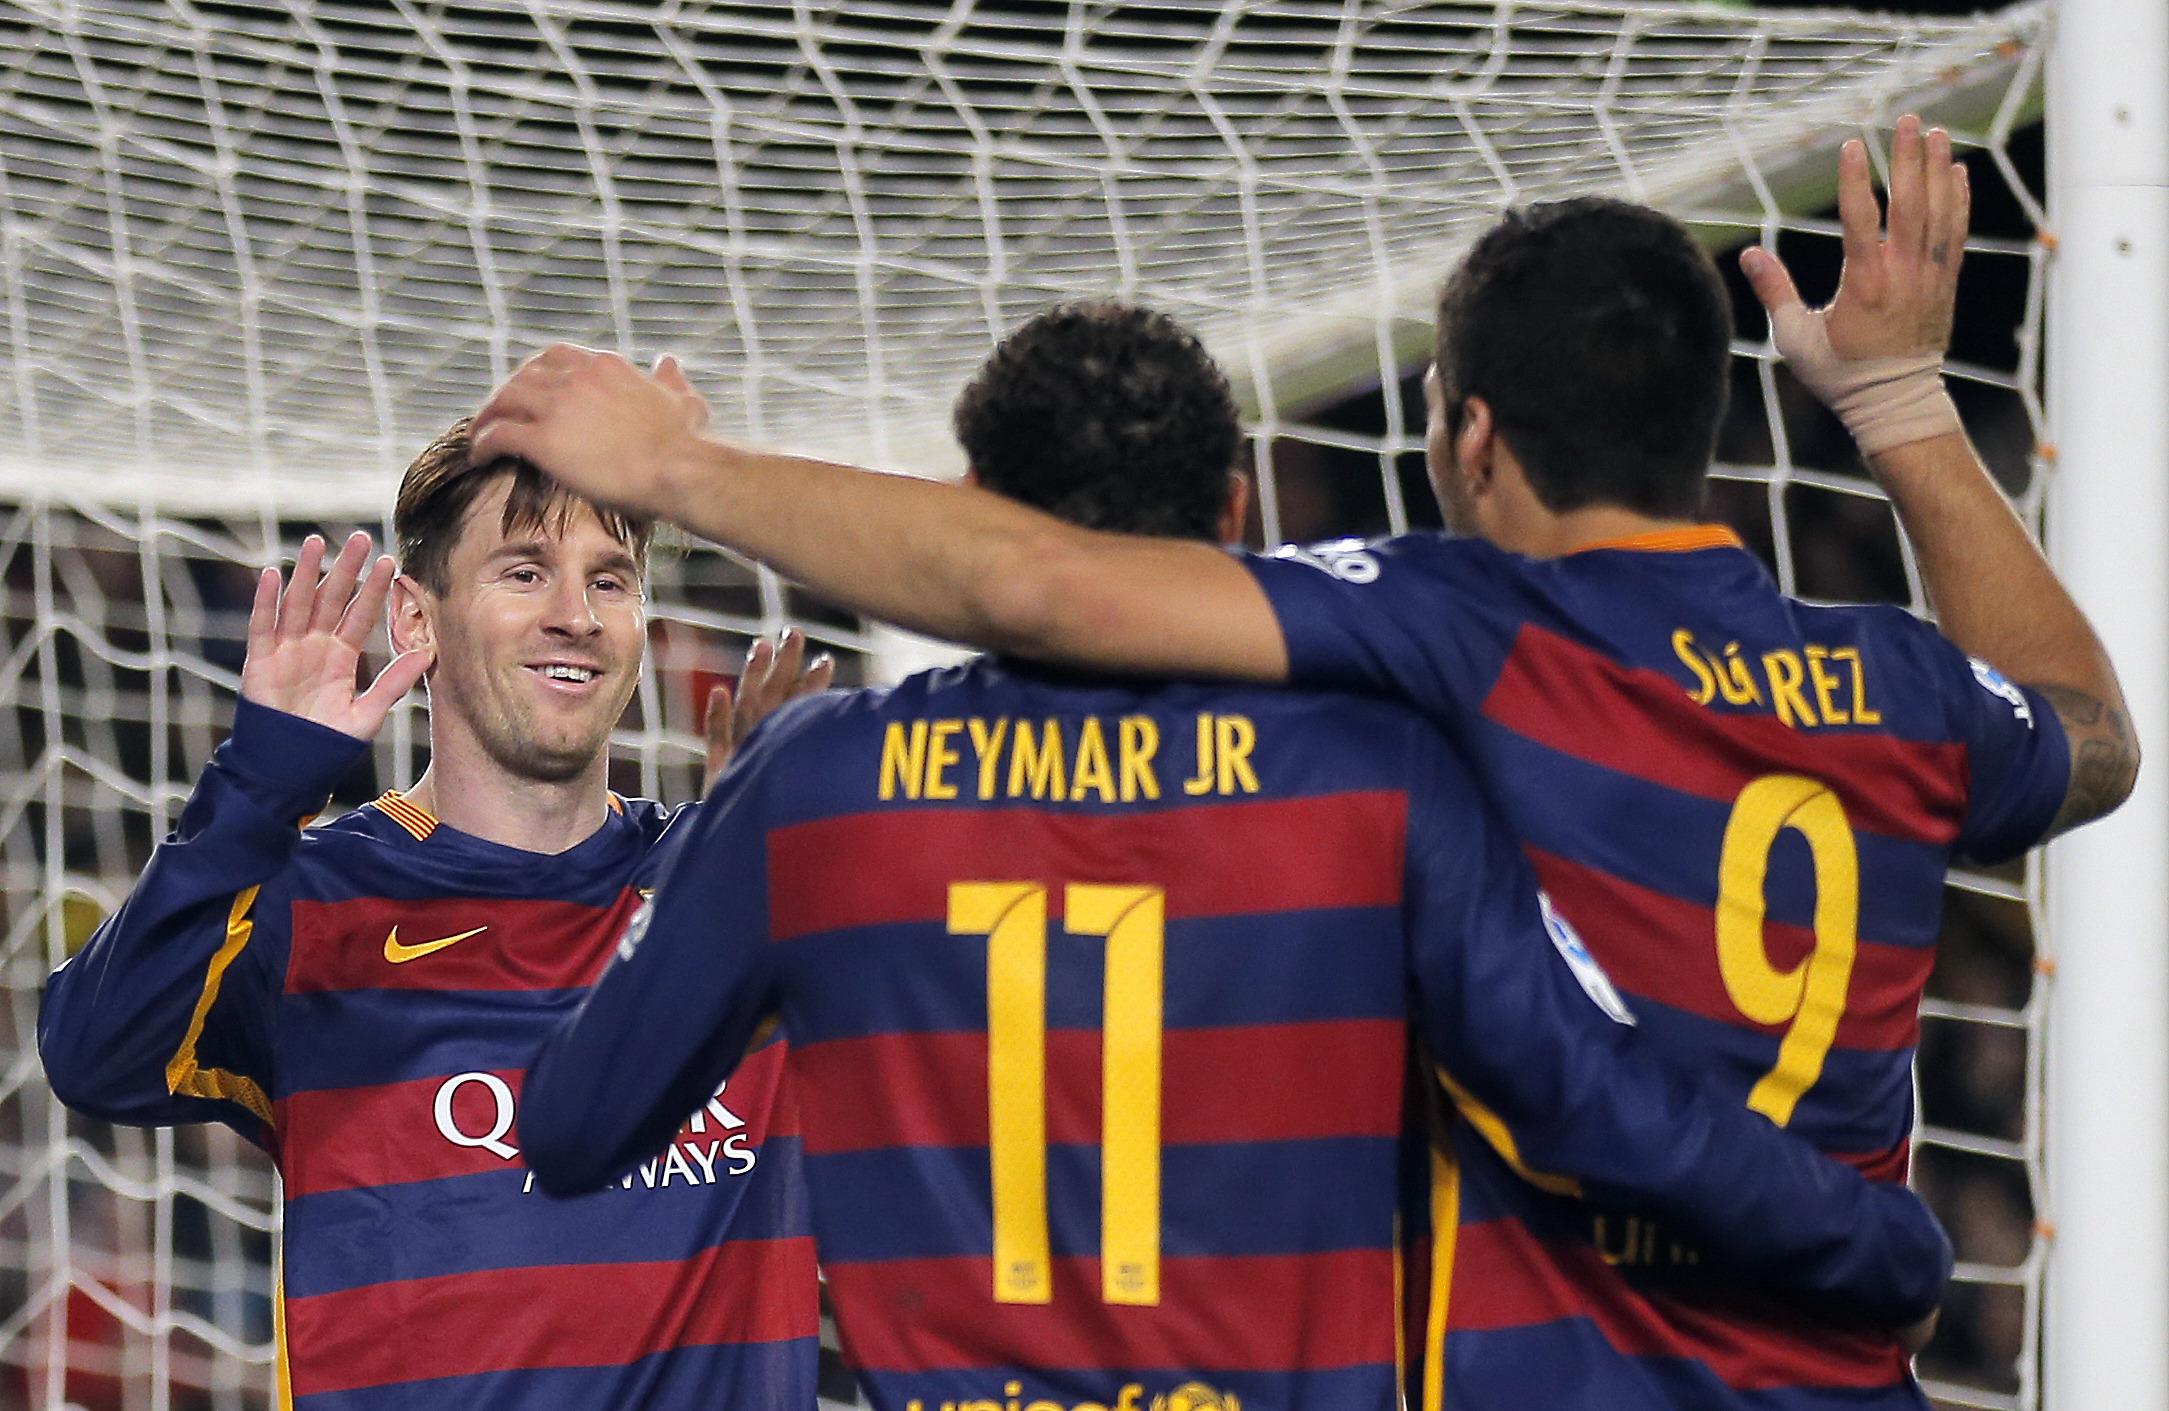 Lionel Messi, Luis Suarez, Neymar